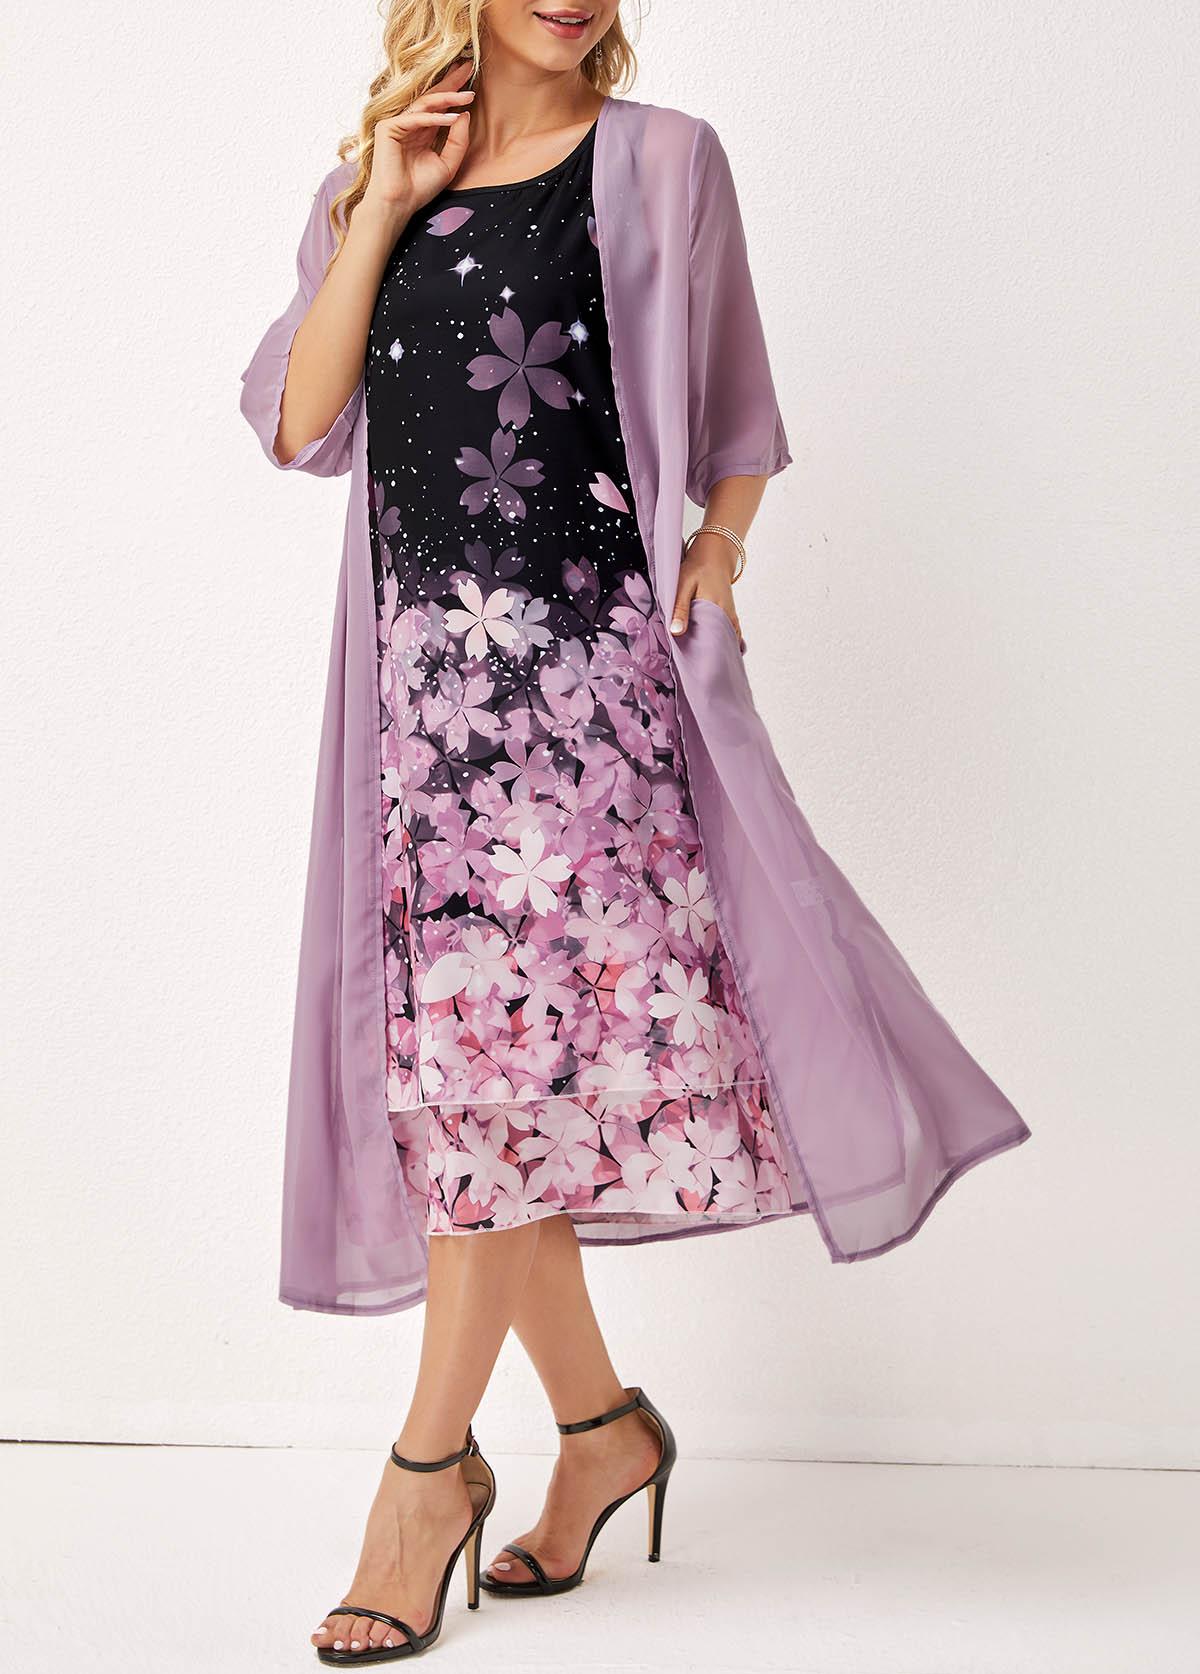 Floral Print Layered Round Neck Three Quarters Sleeve Dress